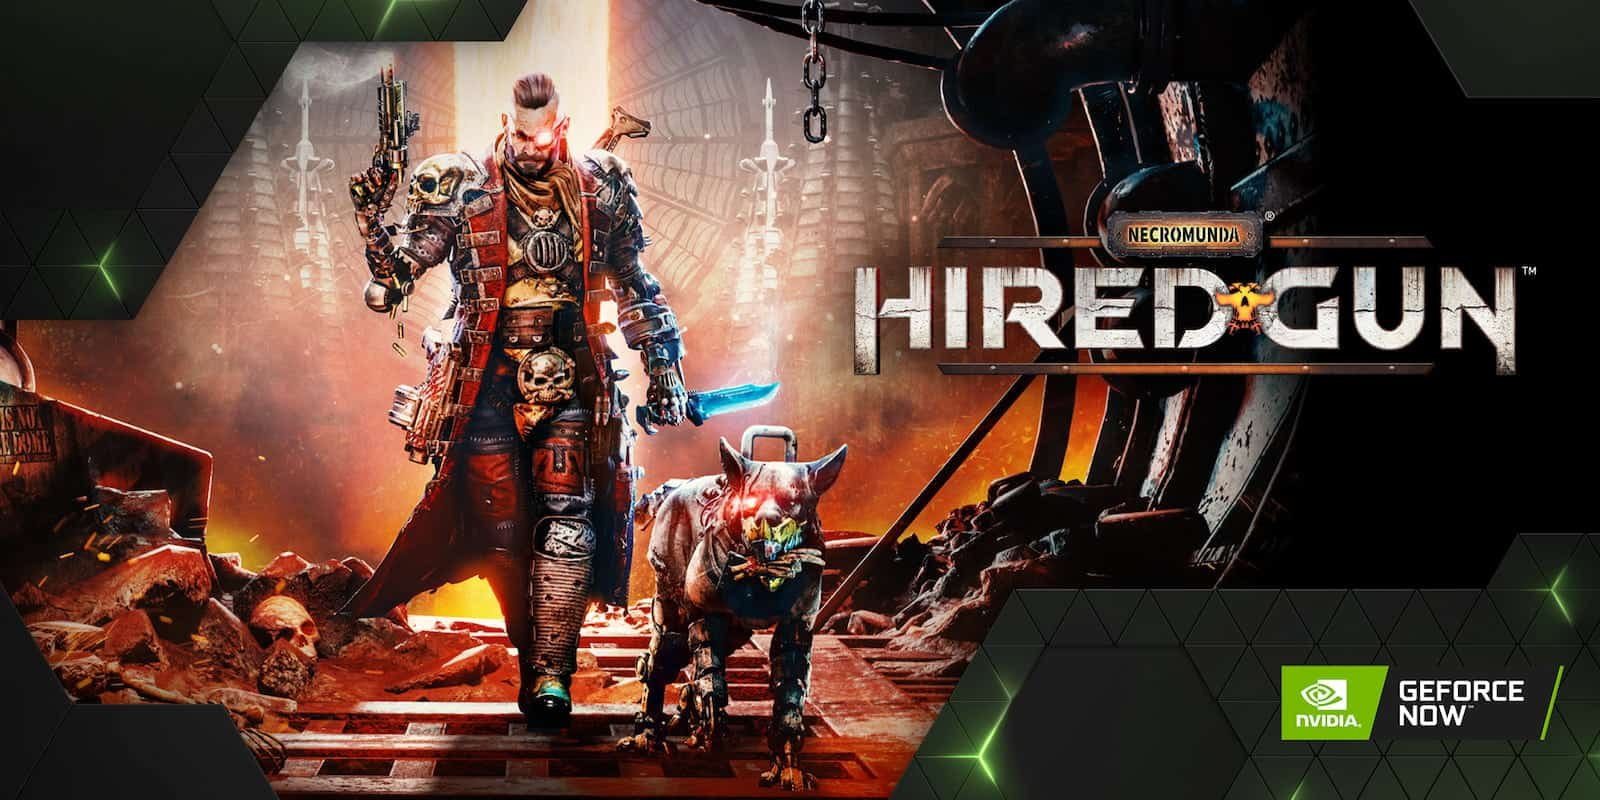 NVIDIA GeForce NOW June 1